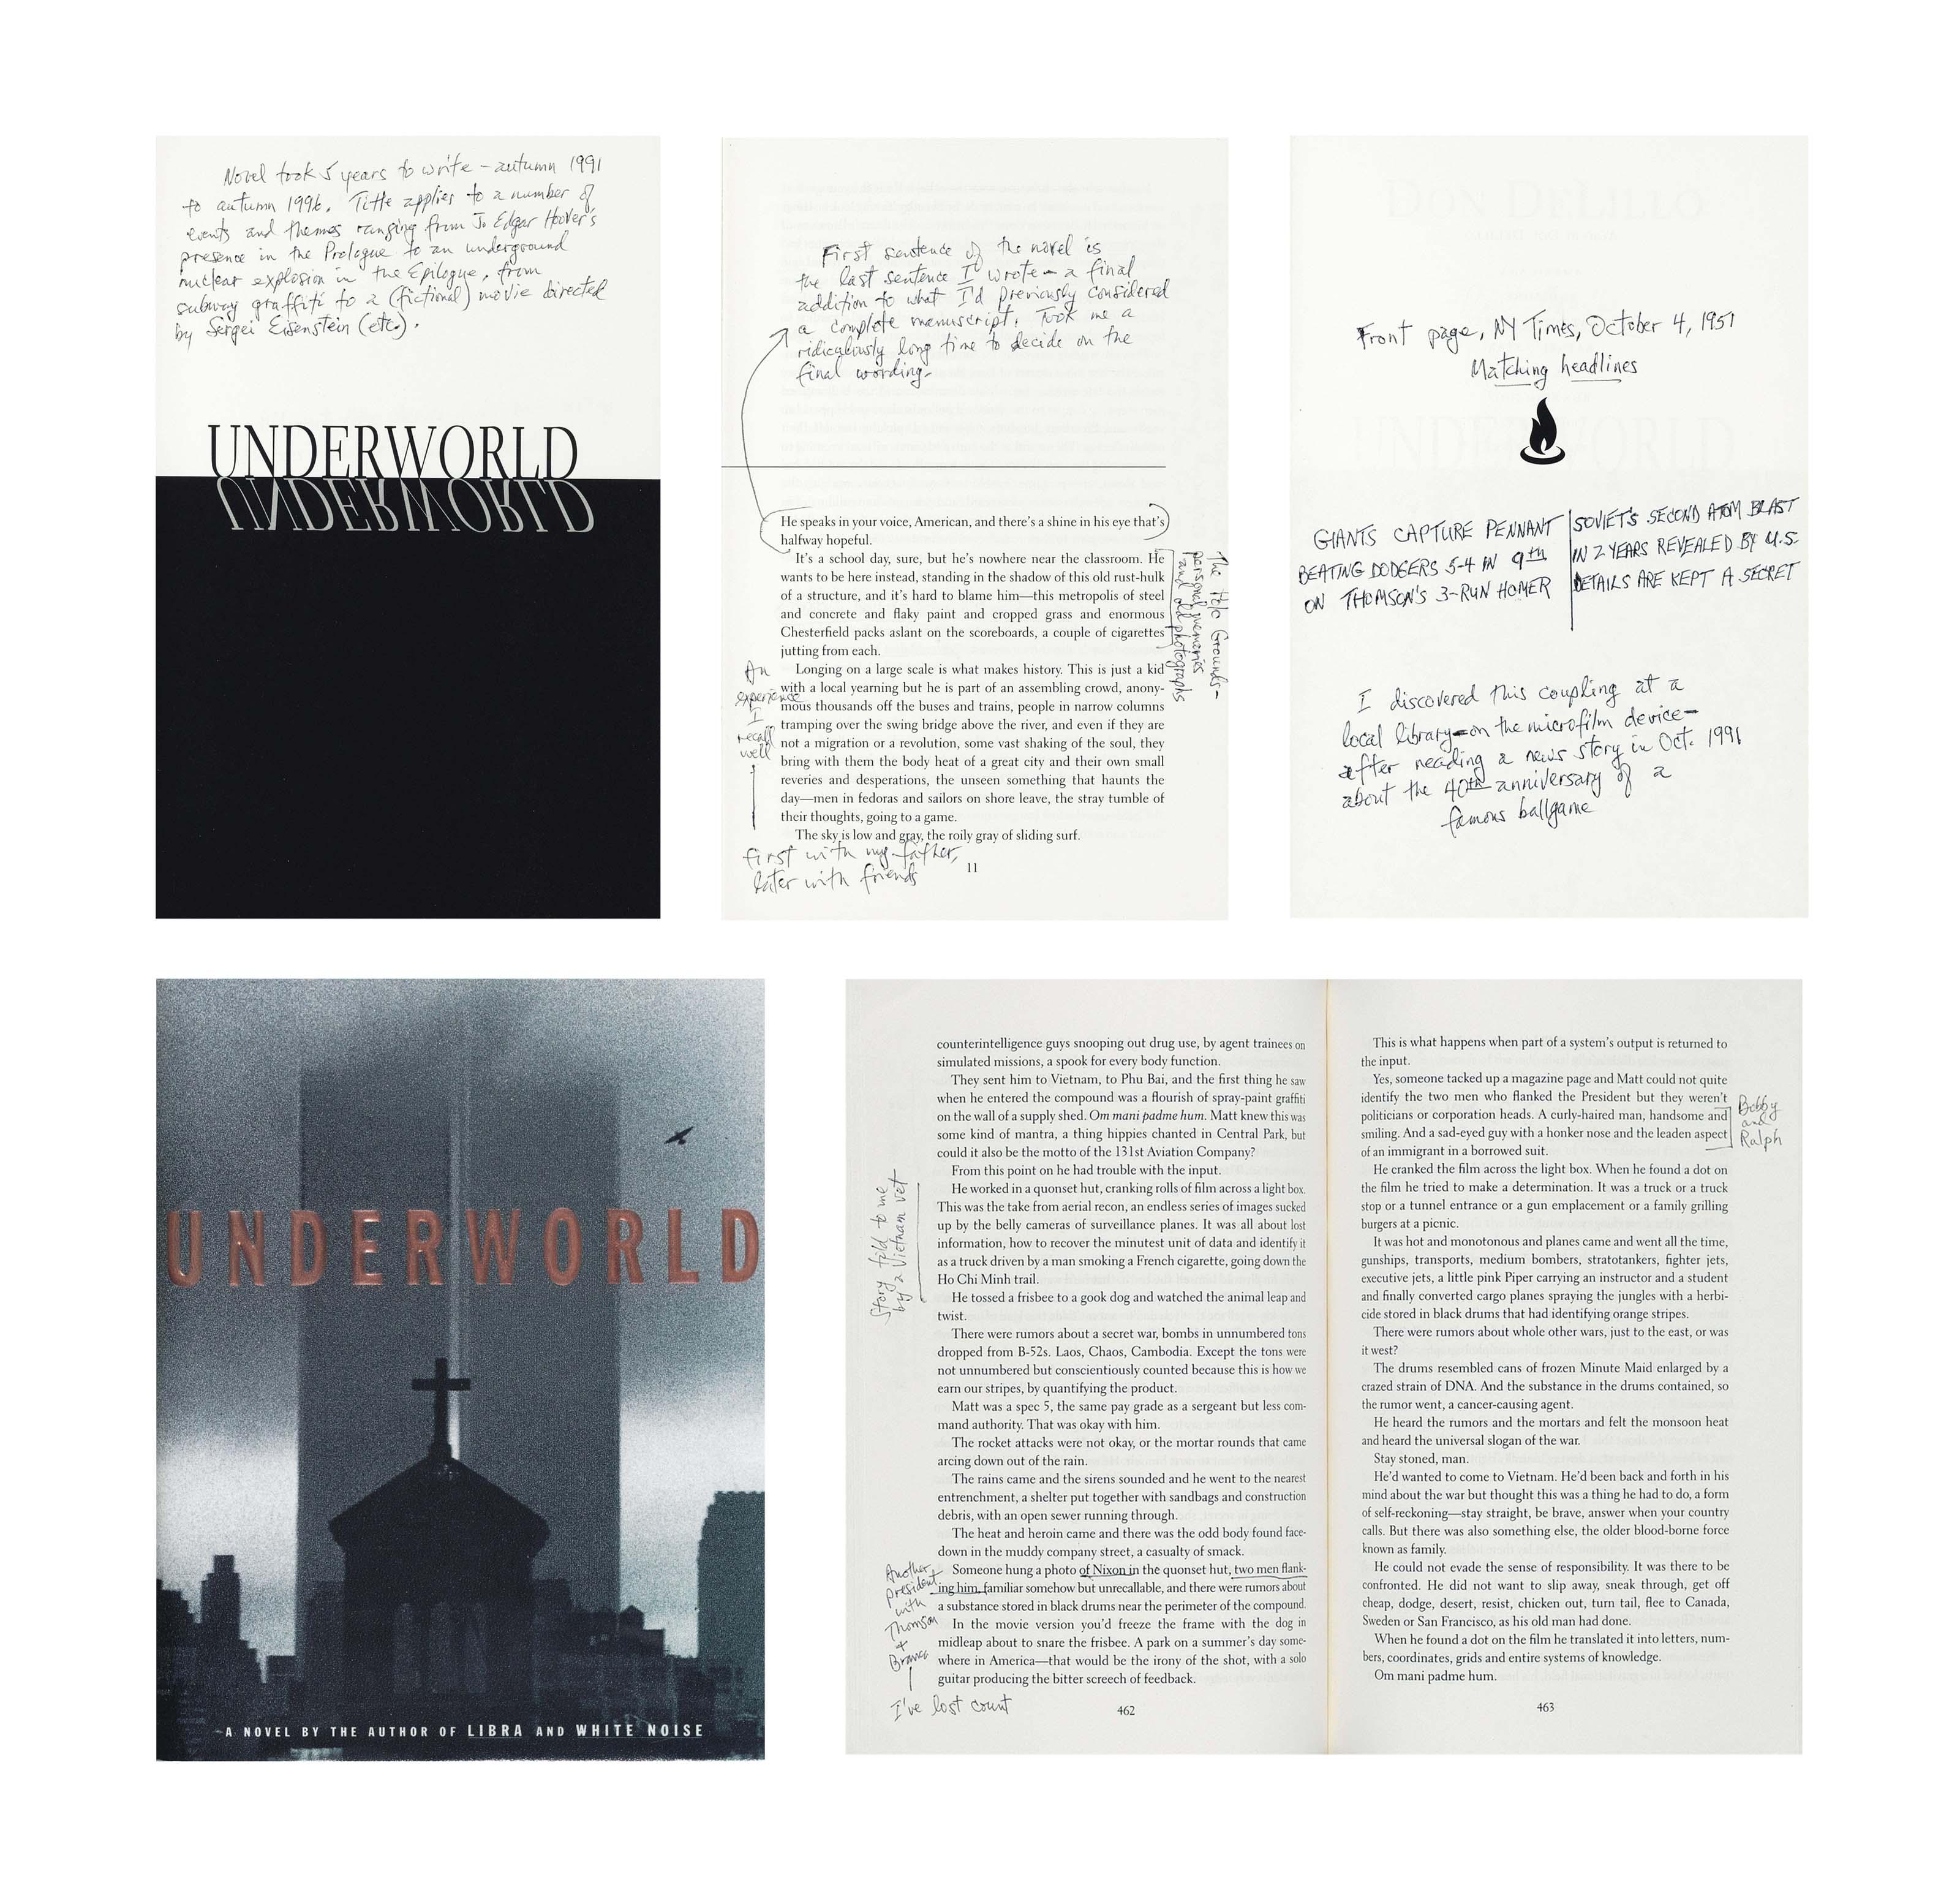 DeLILLO, Don (b. 1936). Underworld. (New York: Scribners, 1997). 8°. Original cloth-backed boards; dust-jacket.